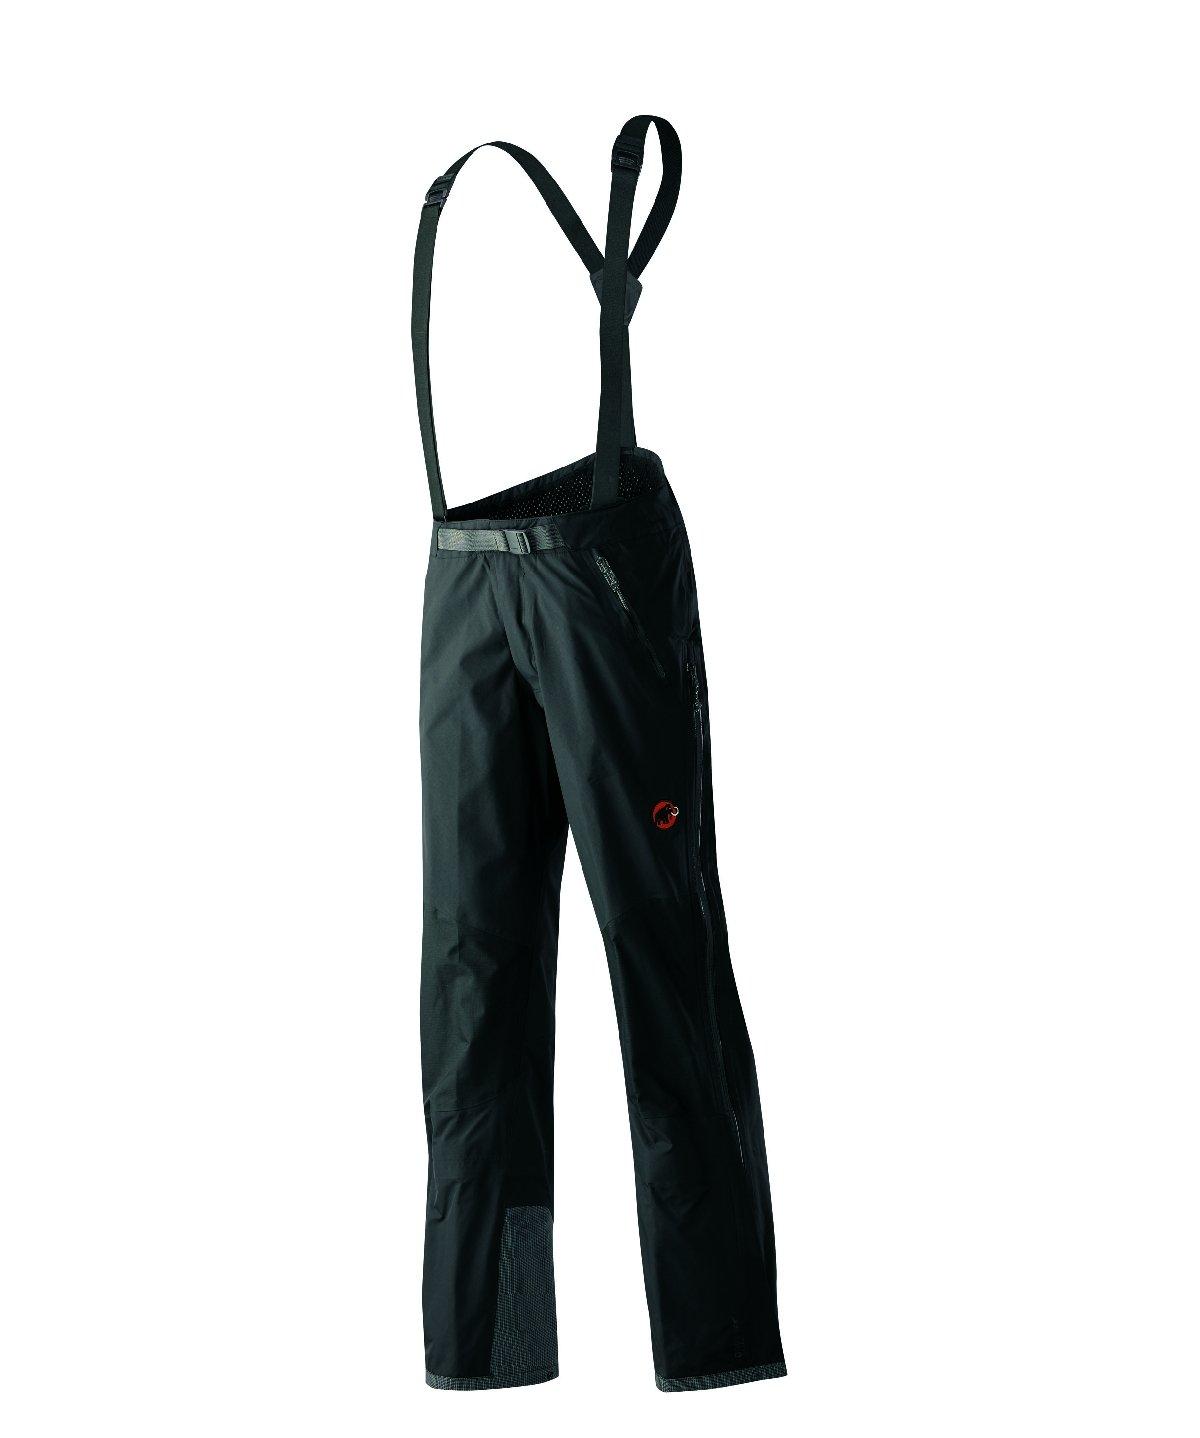 Mammut Herren Hose Albaron Pants